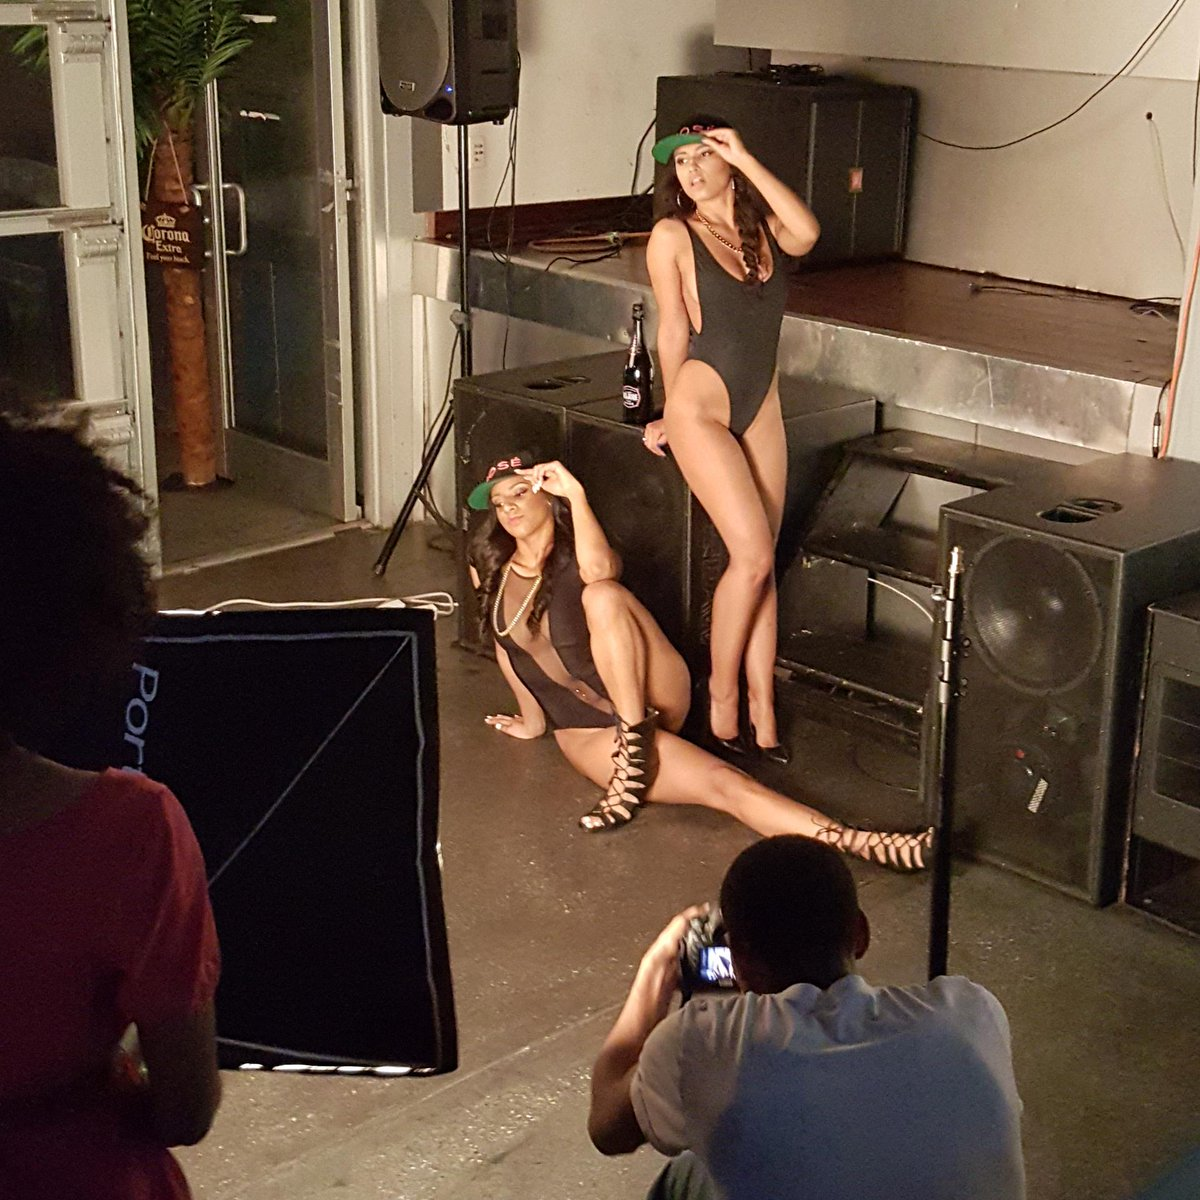 #BlackBottleGirls photoshoot http://t.co/6zwijc2tQd